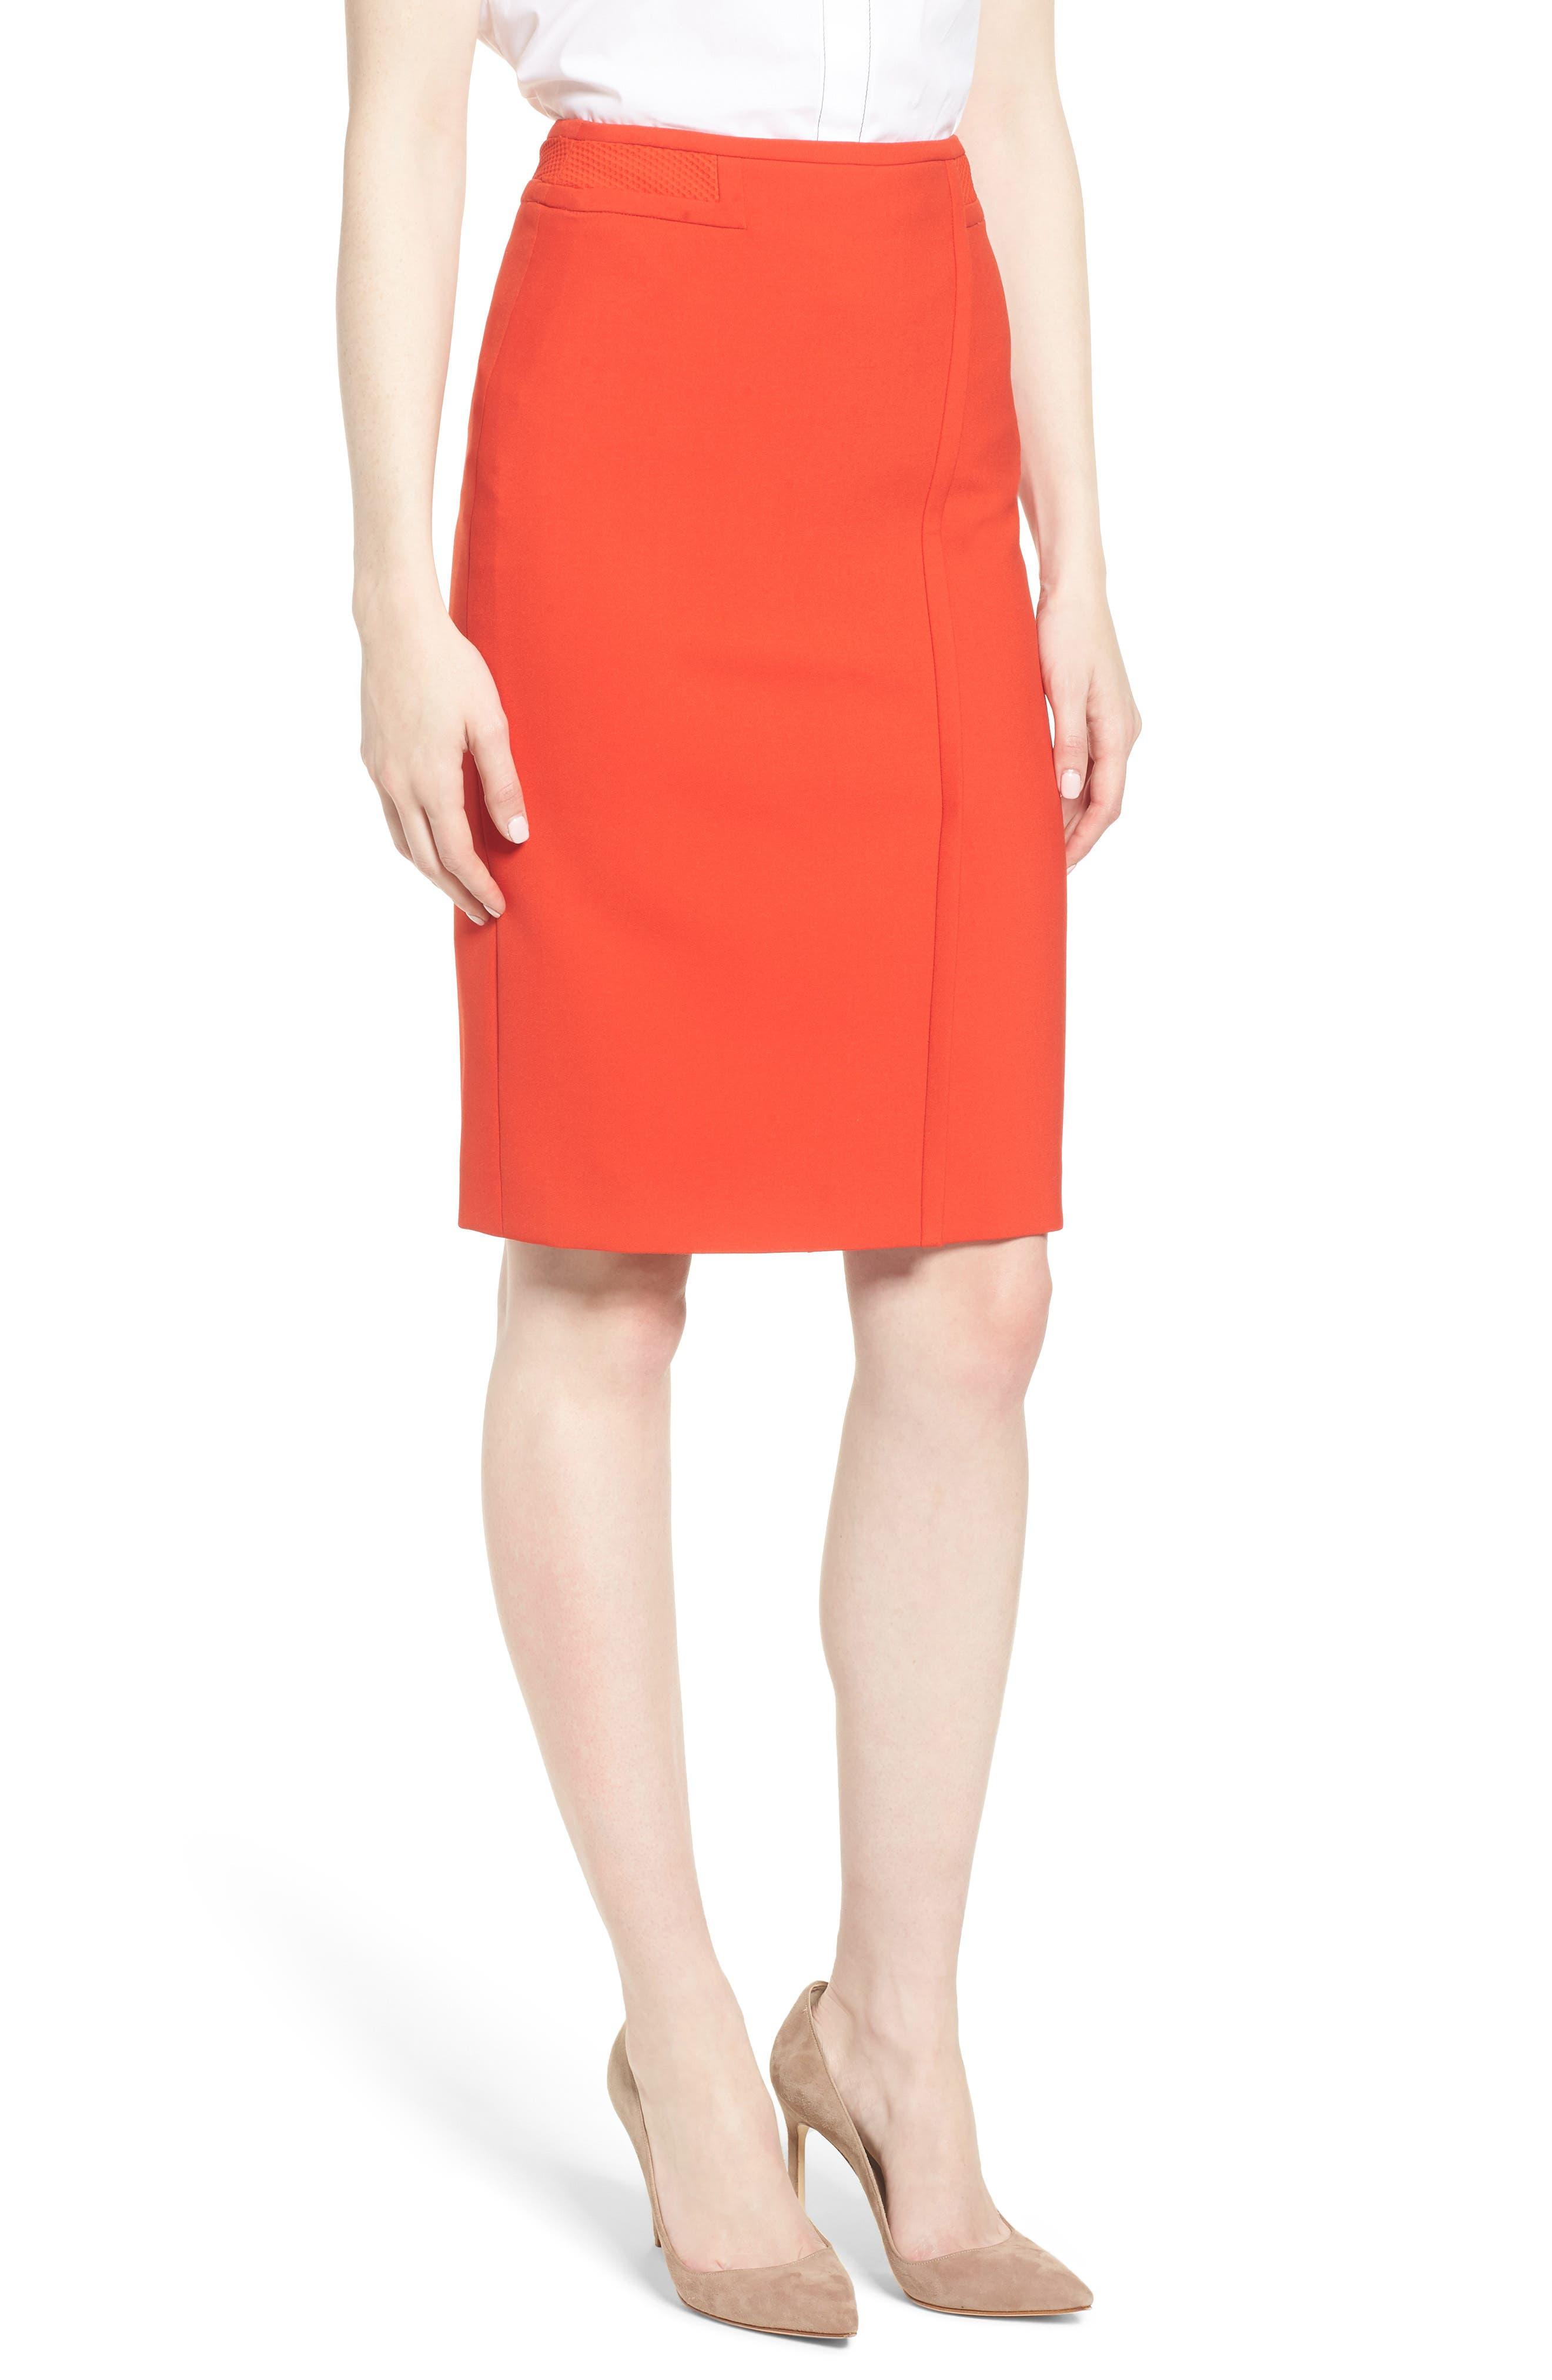 Vadama Ponte Pencil Skirt,                             Main thumbnail 1, color,